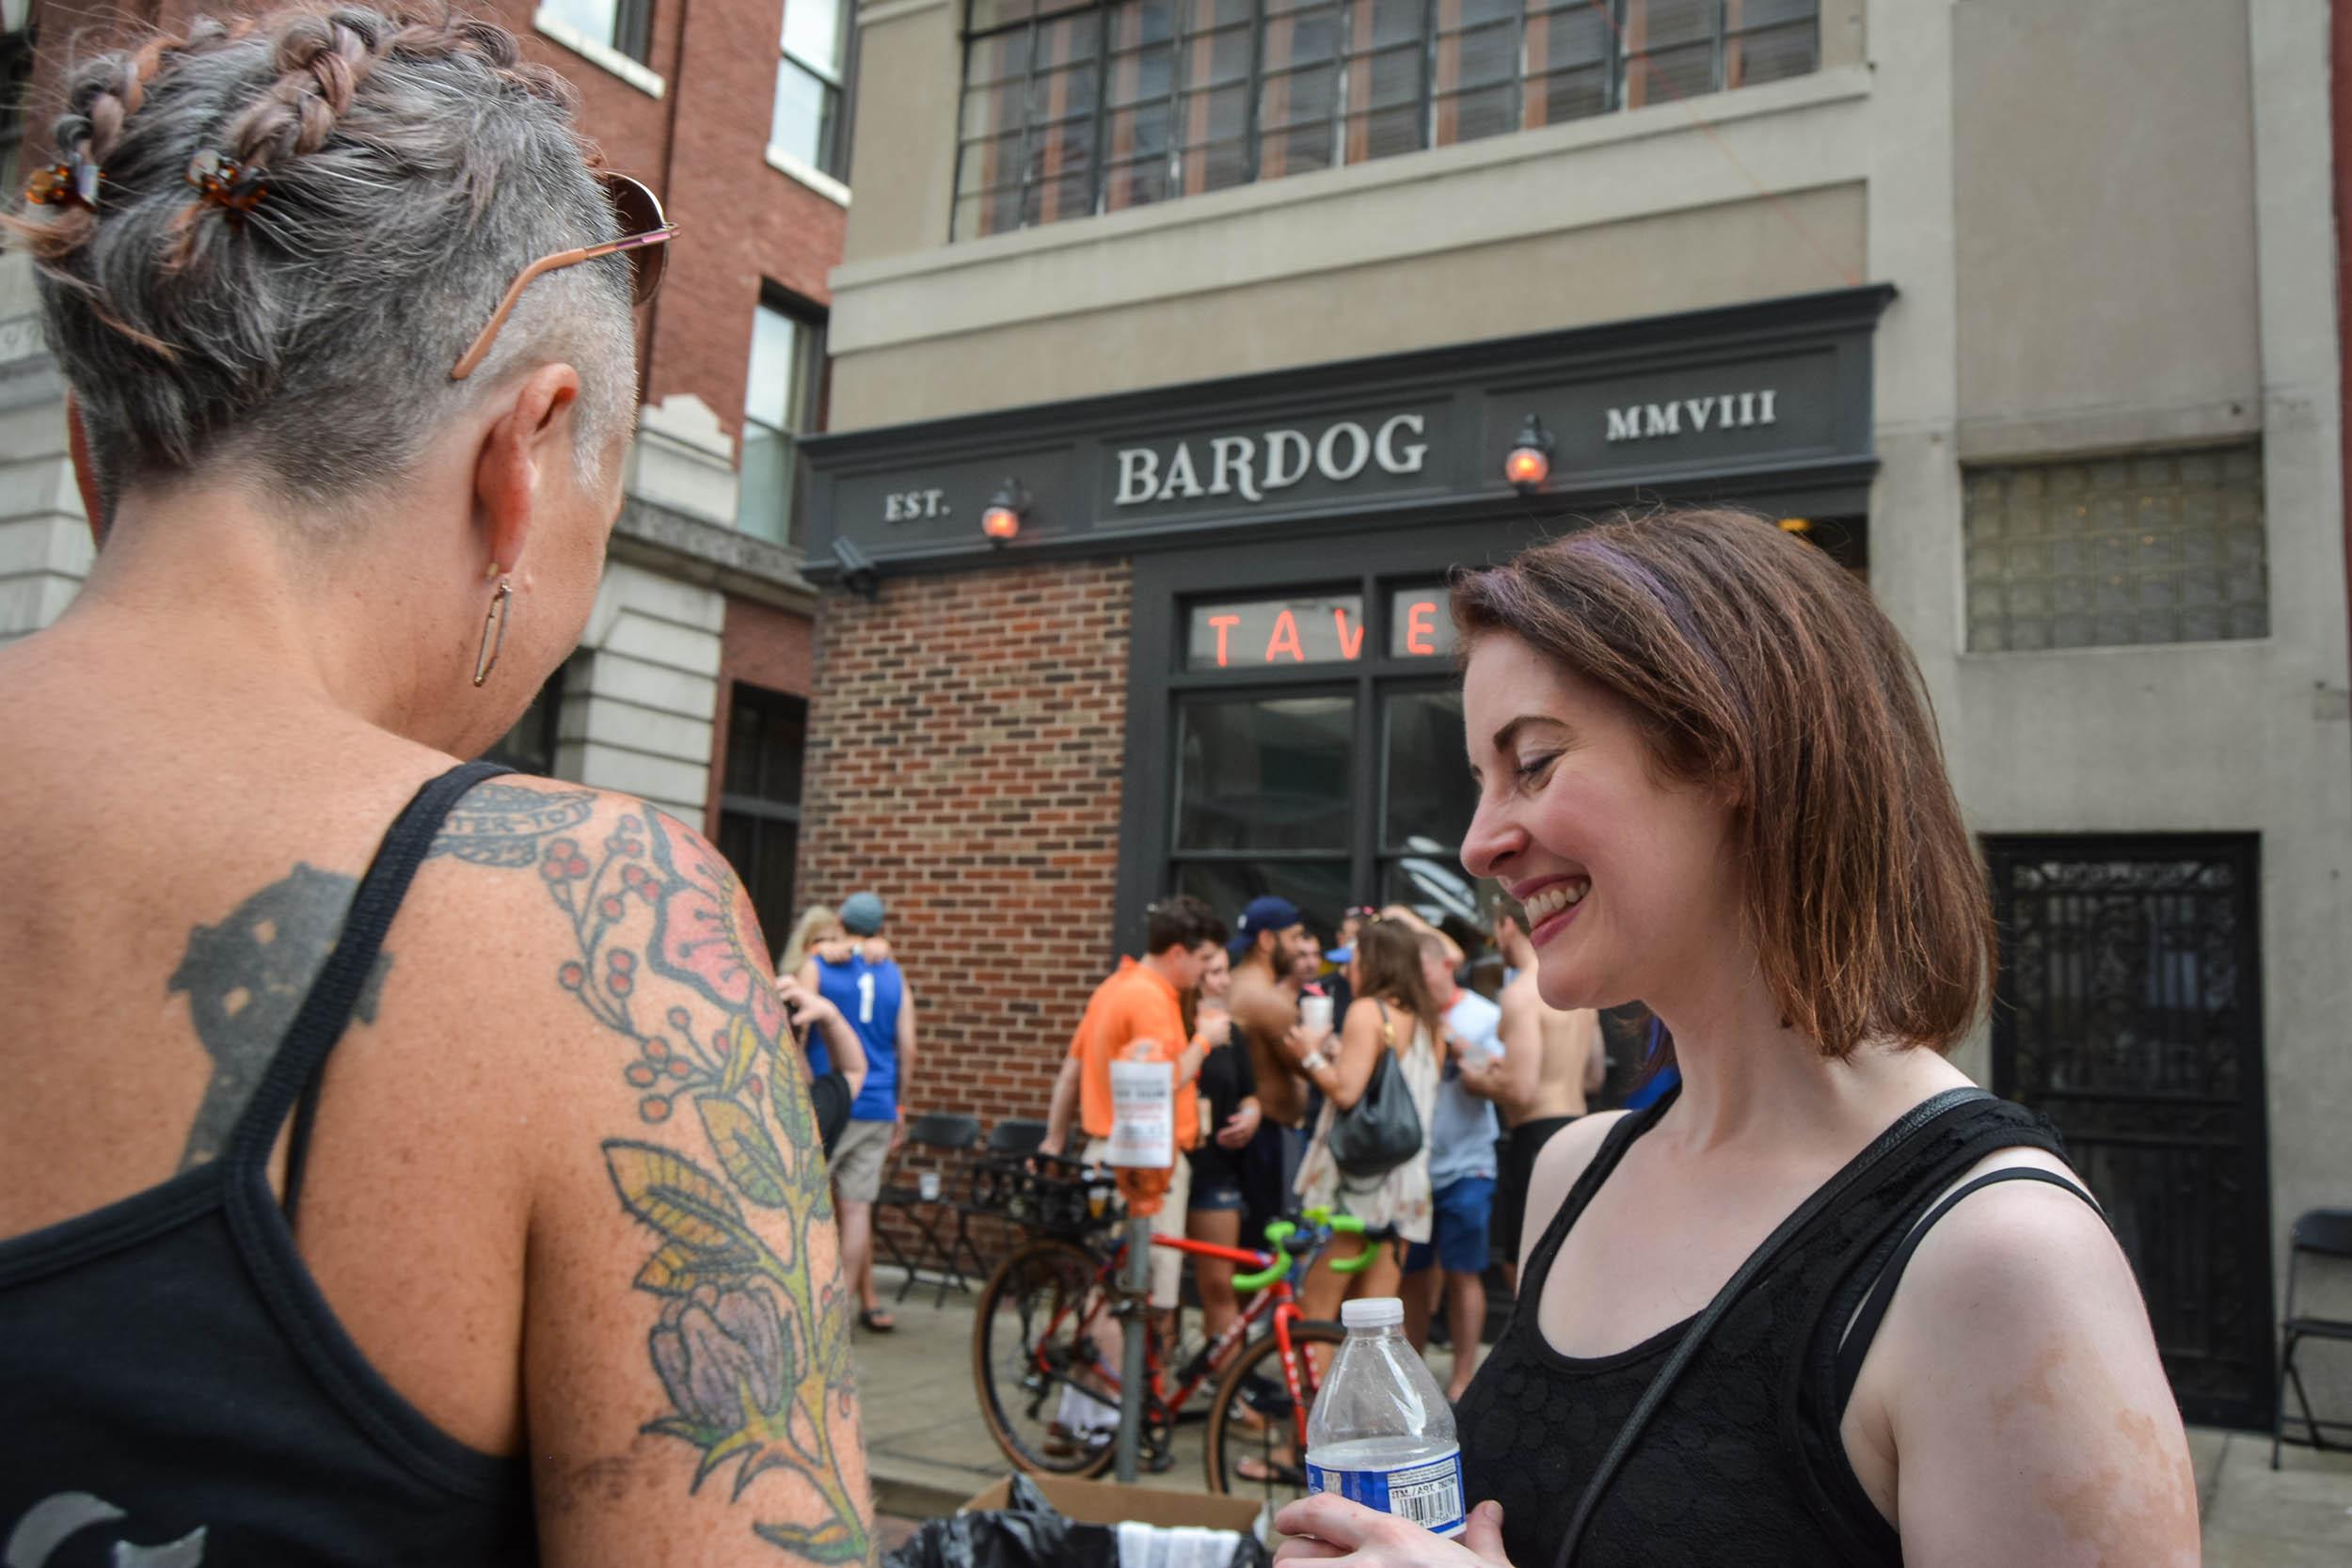 Monroe Avenue Festival Bardog Block Party 0255.jpg